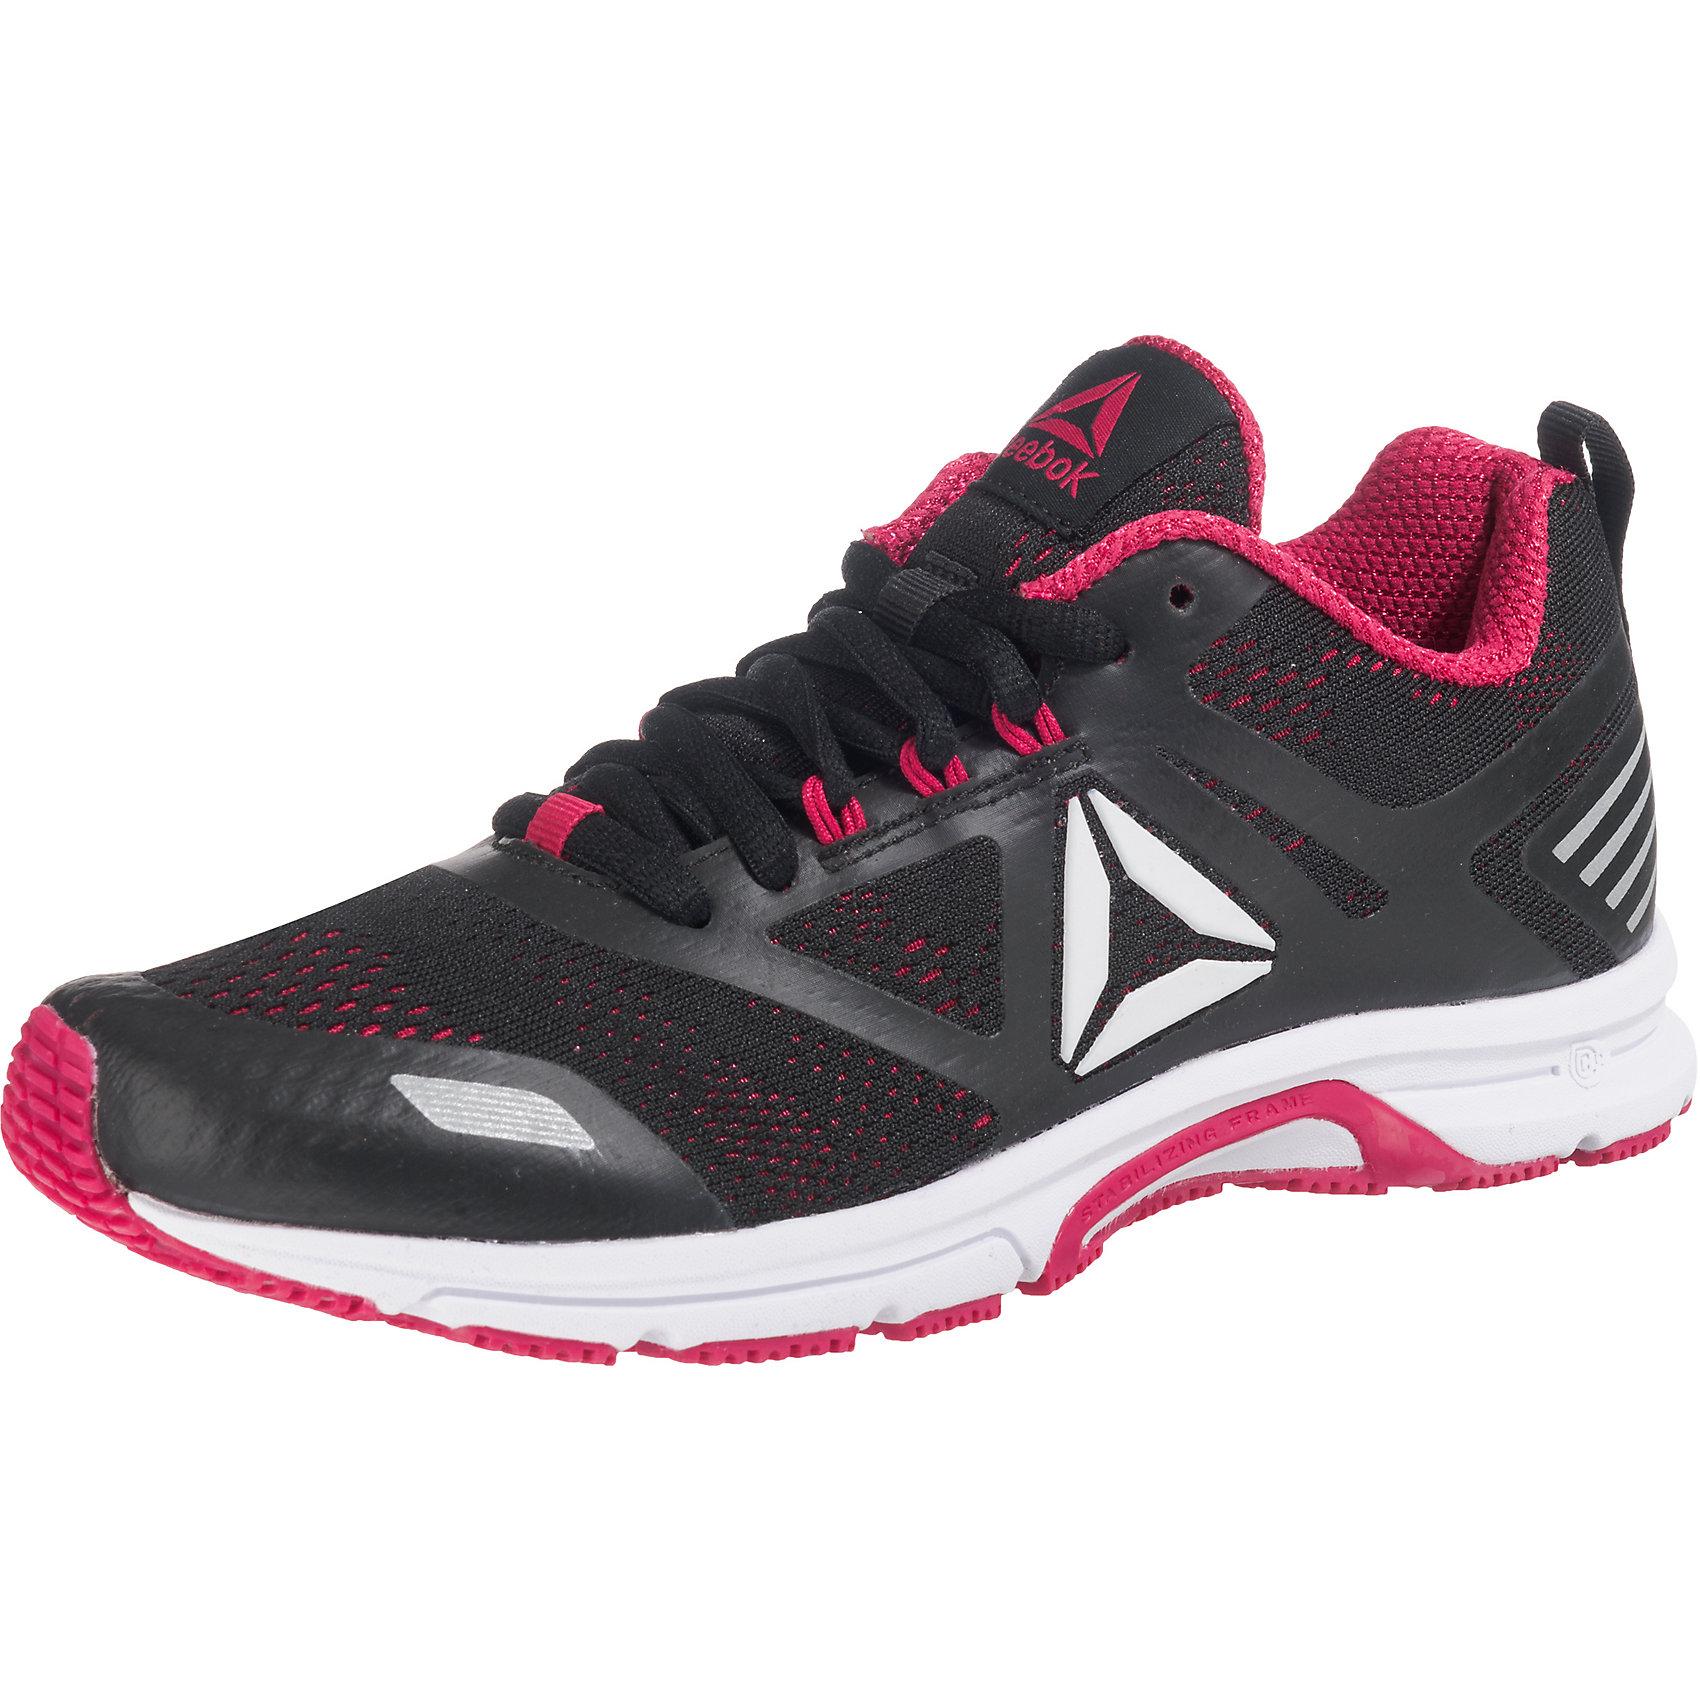 Neu Reebok Ahary Runner Sneakers Low 8643434 für Damen schwarz